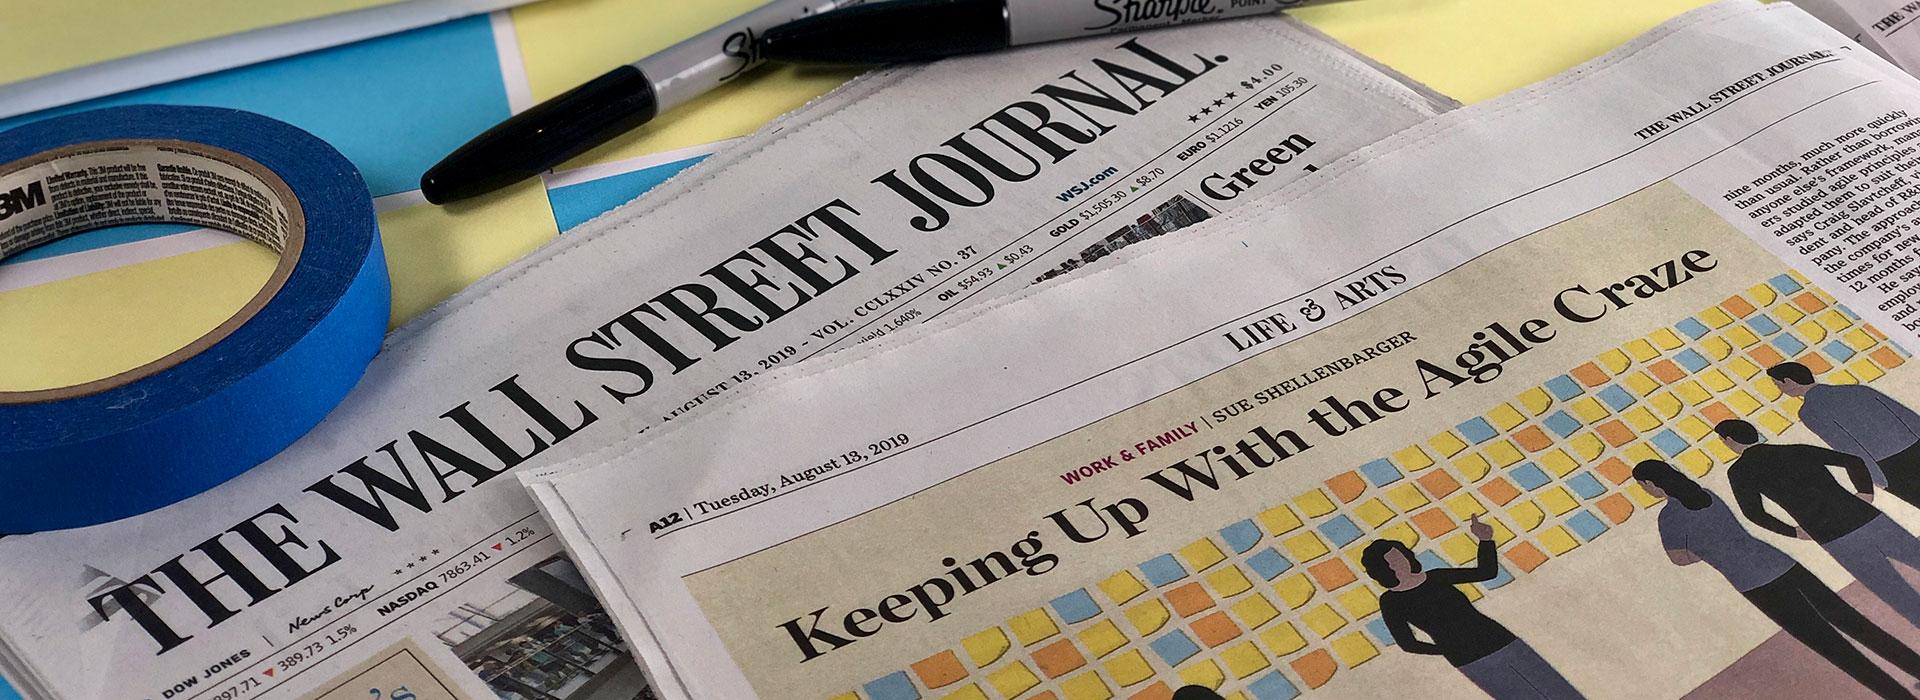 Starmark In Wall Street Journal